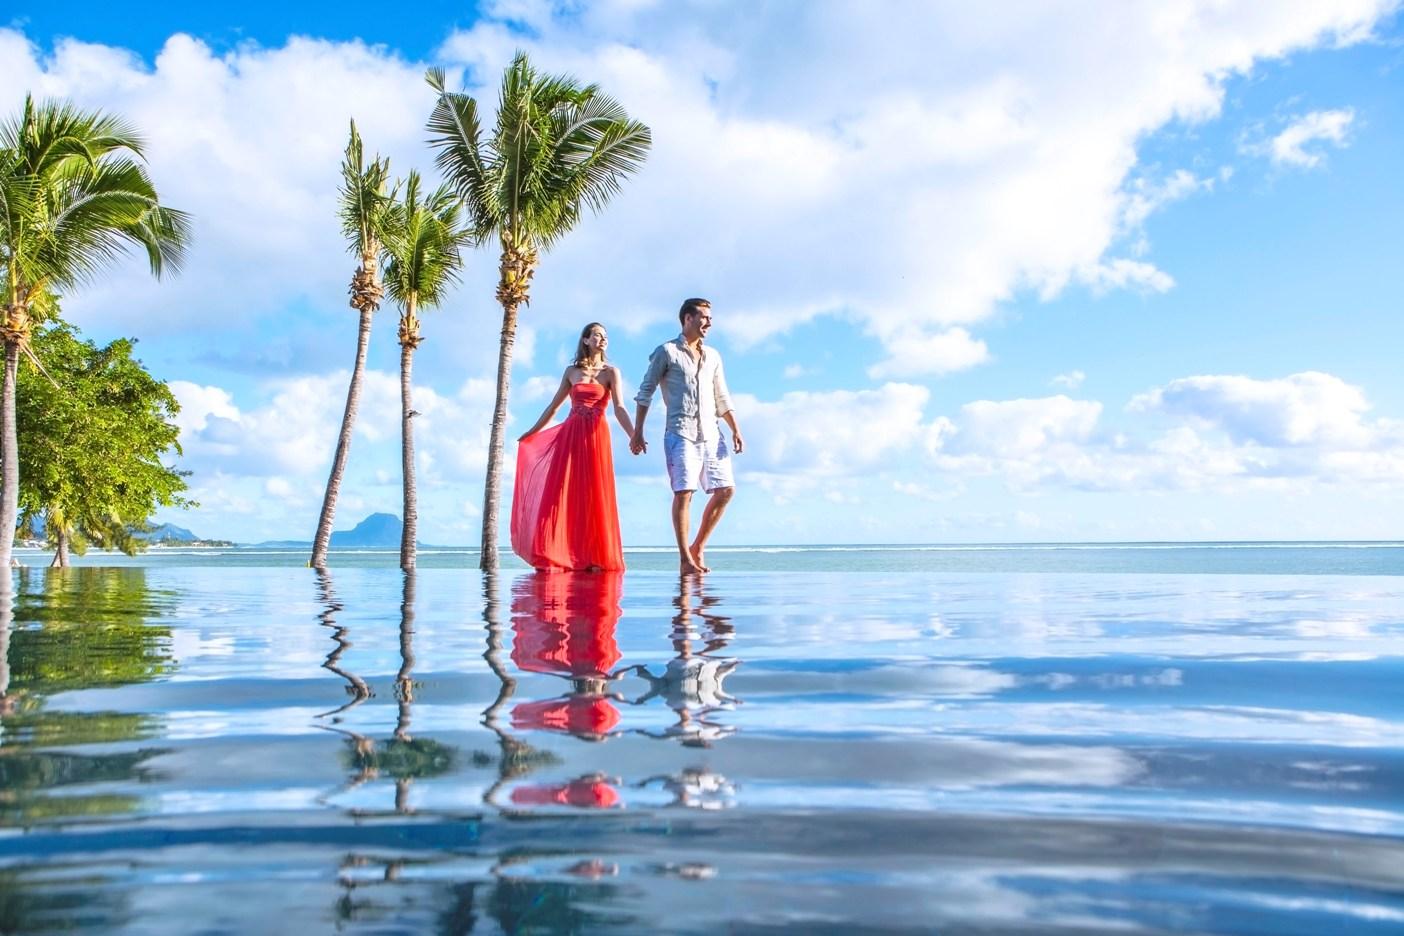 Trinkkuren: Foto vom Wellnesshotel Maradiva Villas Resort and Spa | Wellness Mauritius